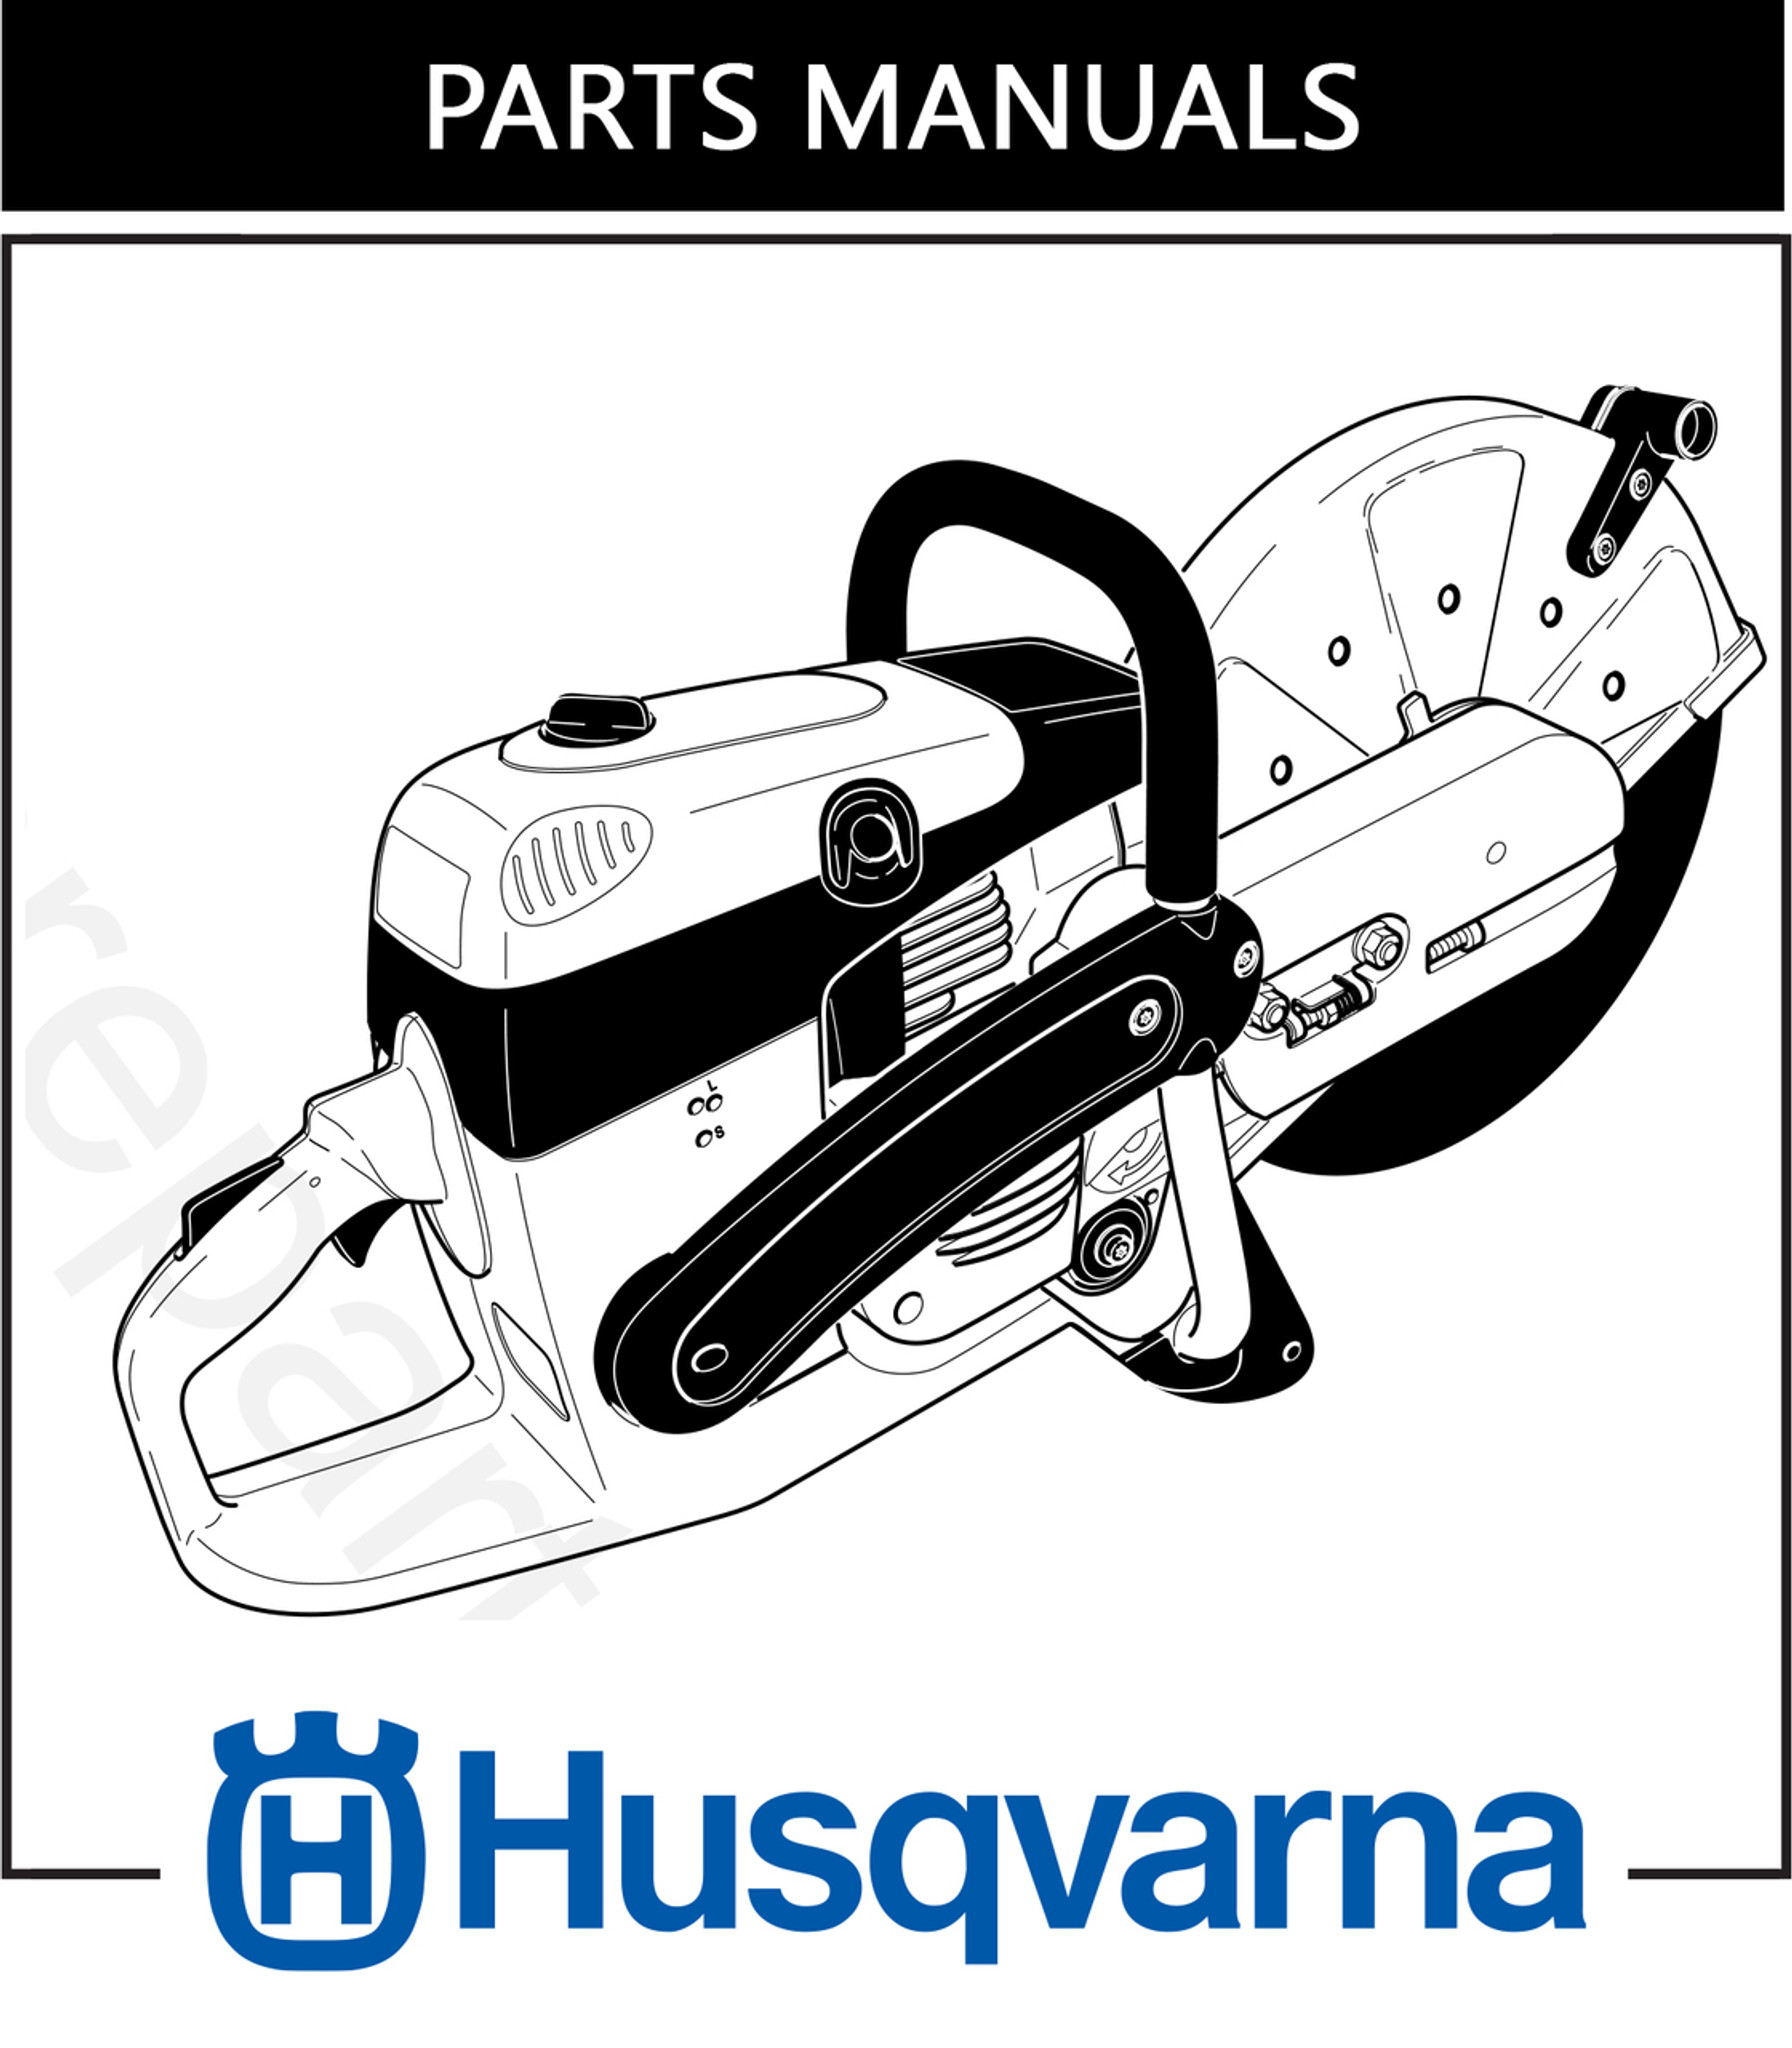 Parts Manual | Husqvarna K960 | Free Download